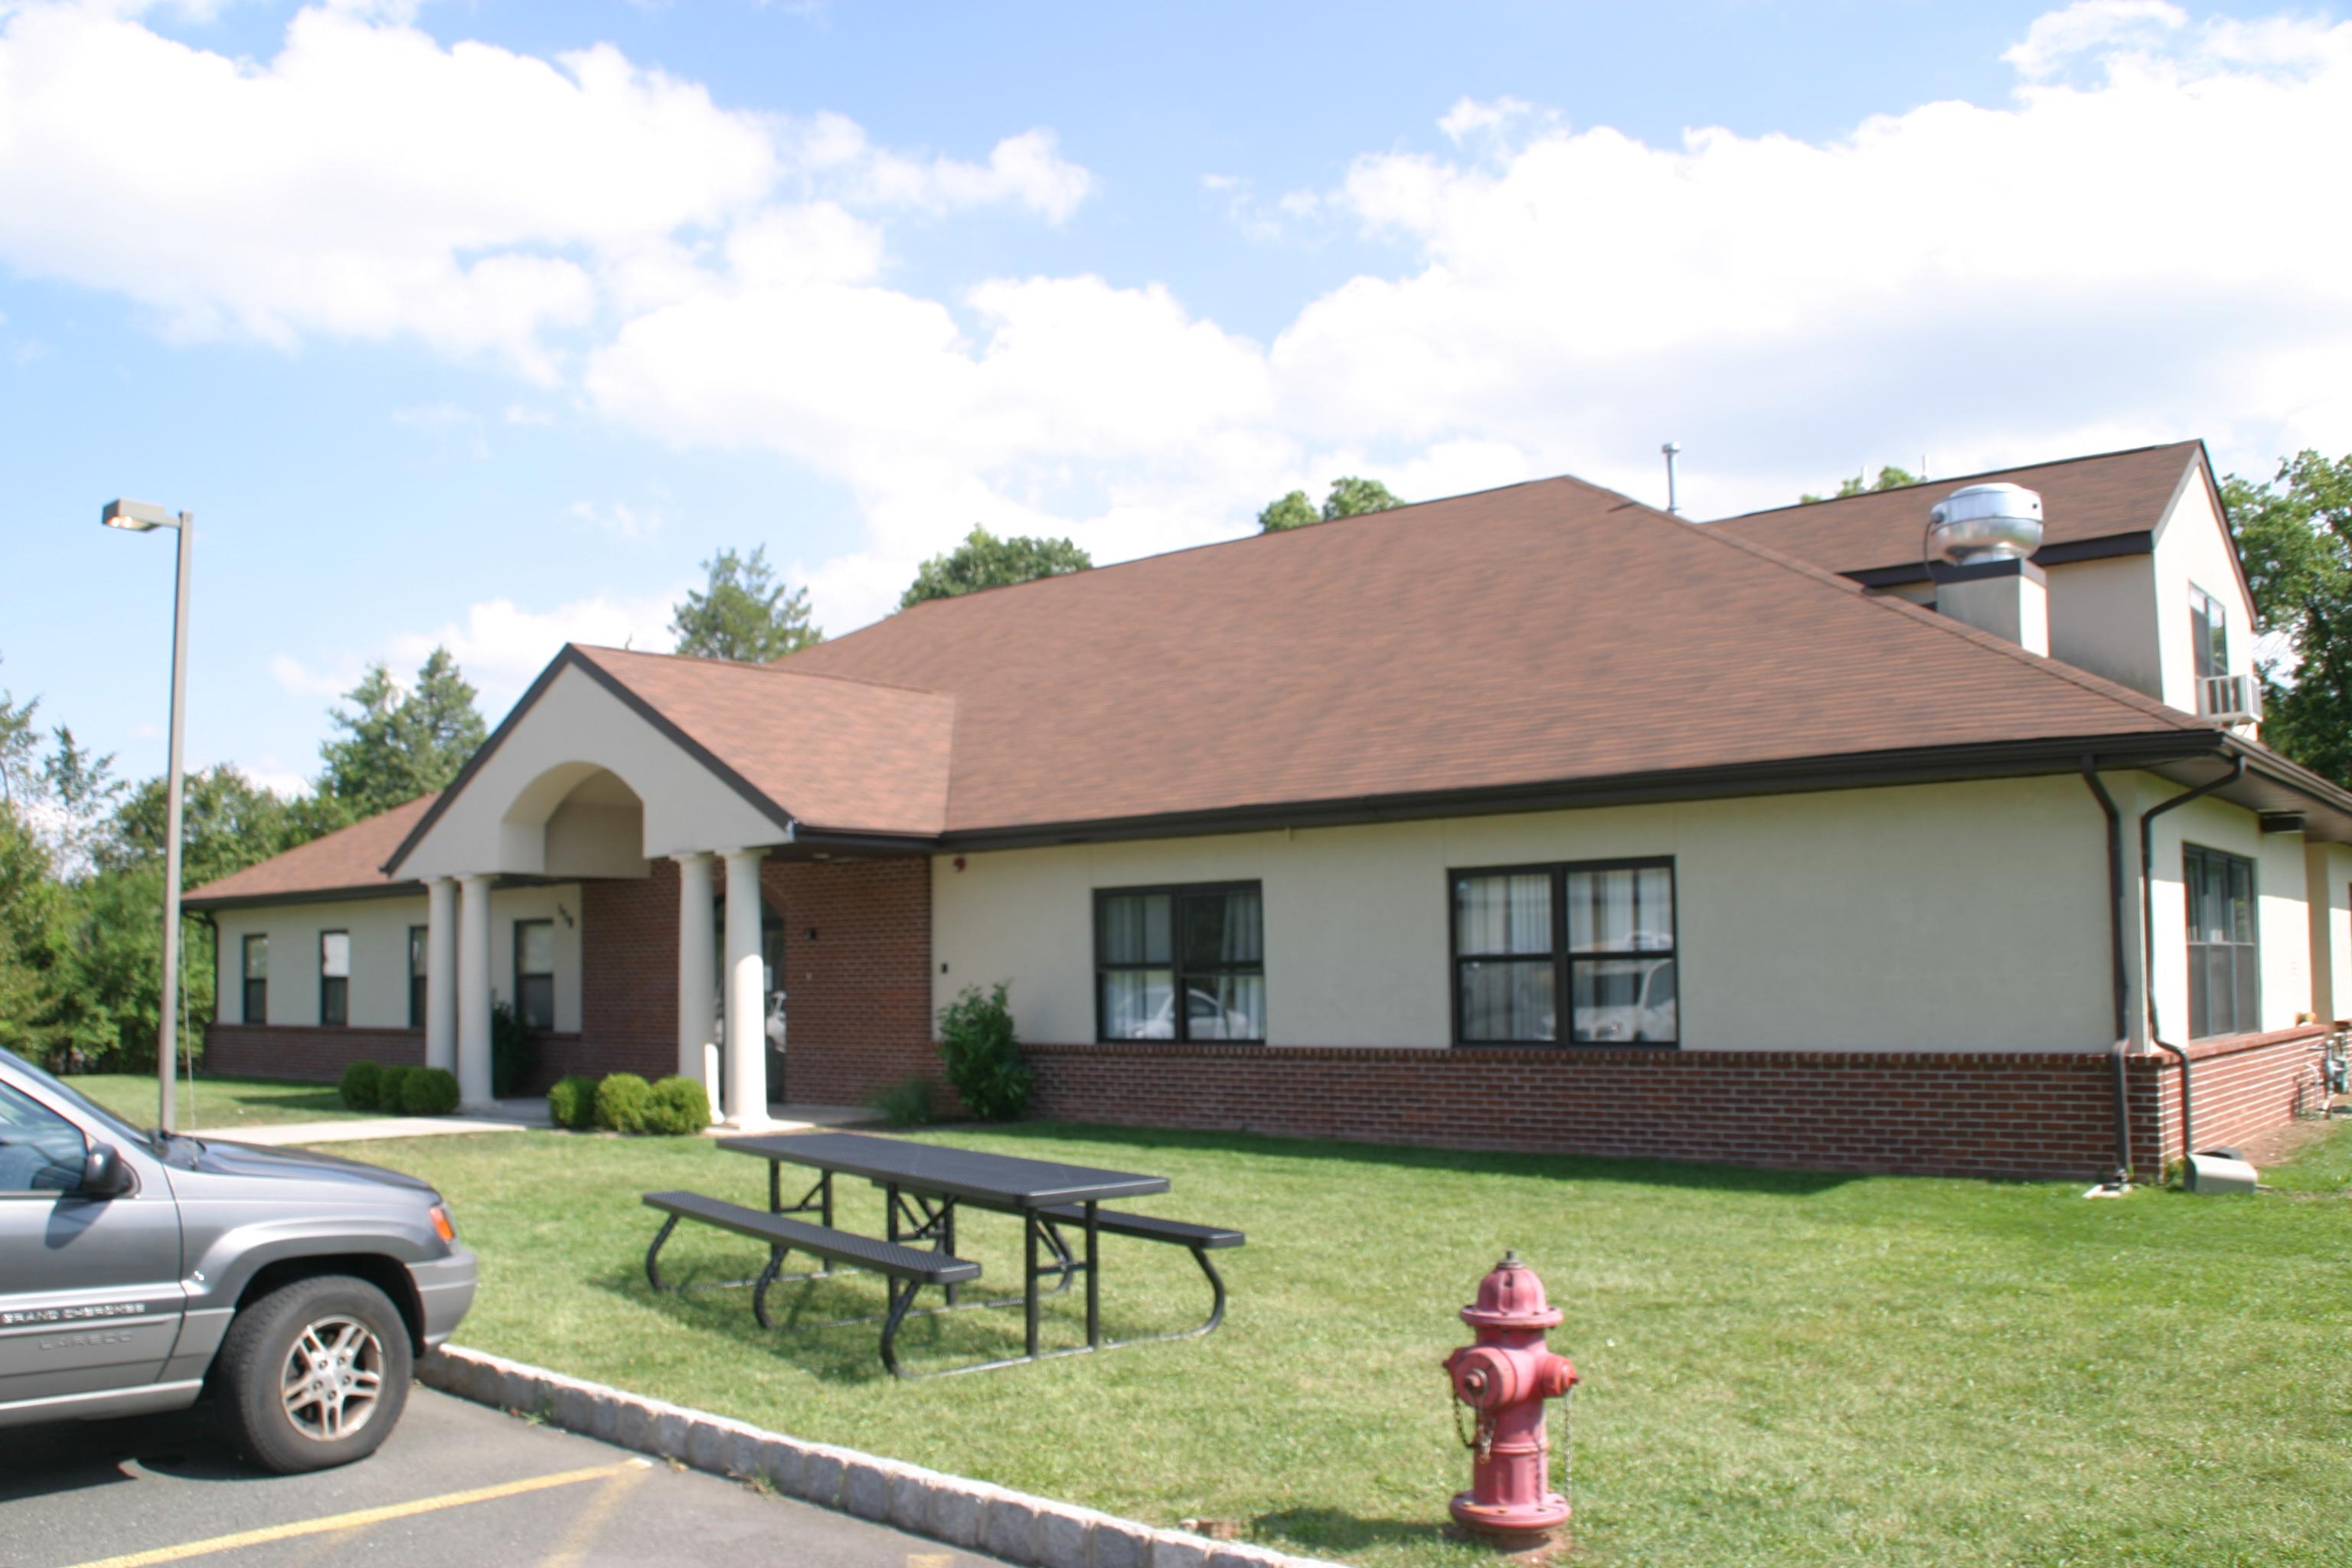 Church rec center roof install